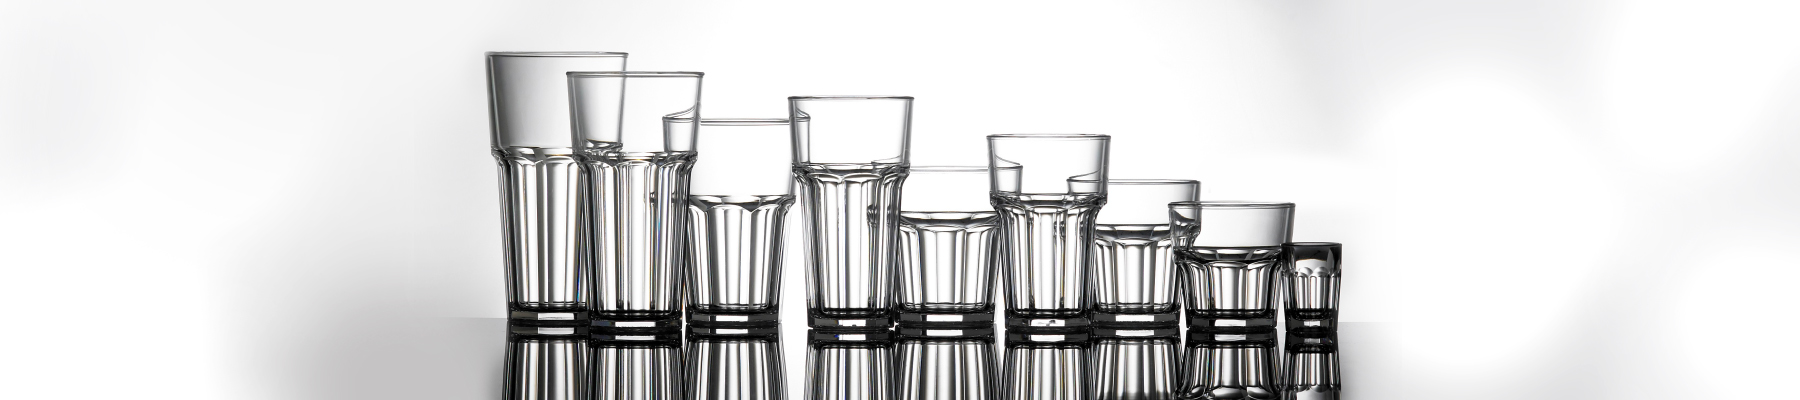 plastic_tumbler_glasses. plastic high ball and plastic tumbler glasses